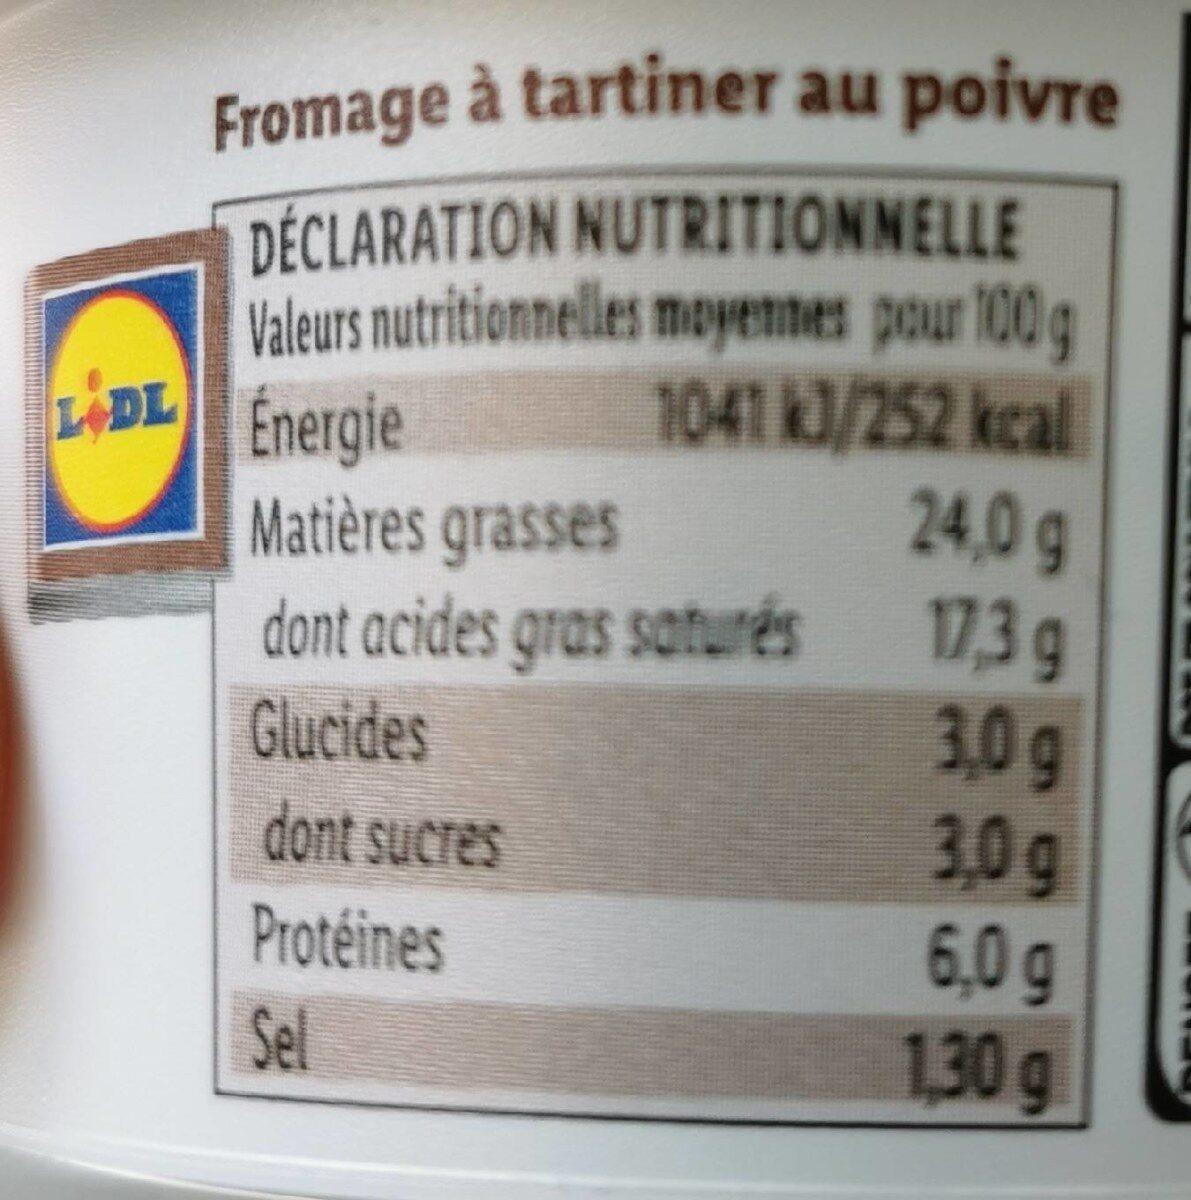 Fromage à tartiner au poivre - Informations nutritionnelles - fr